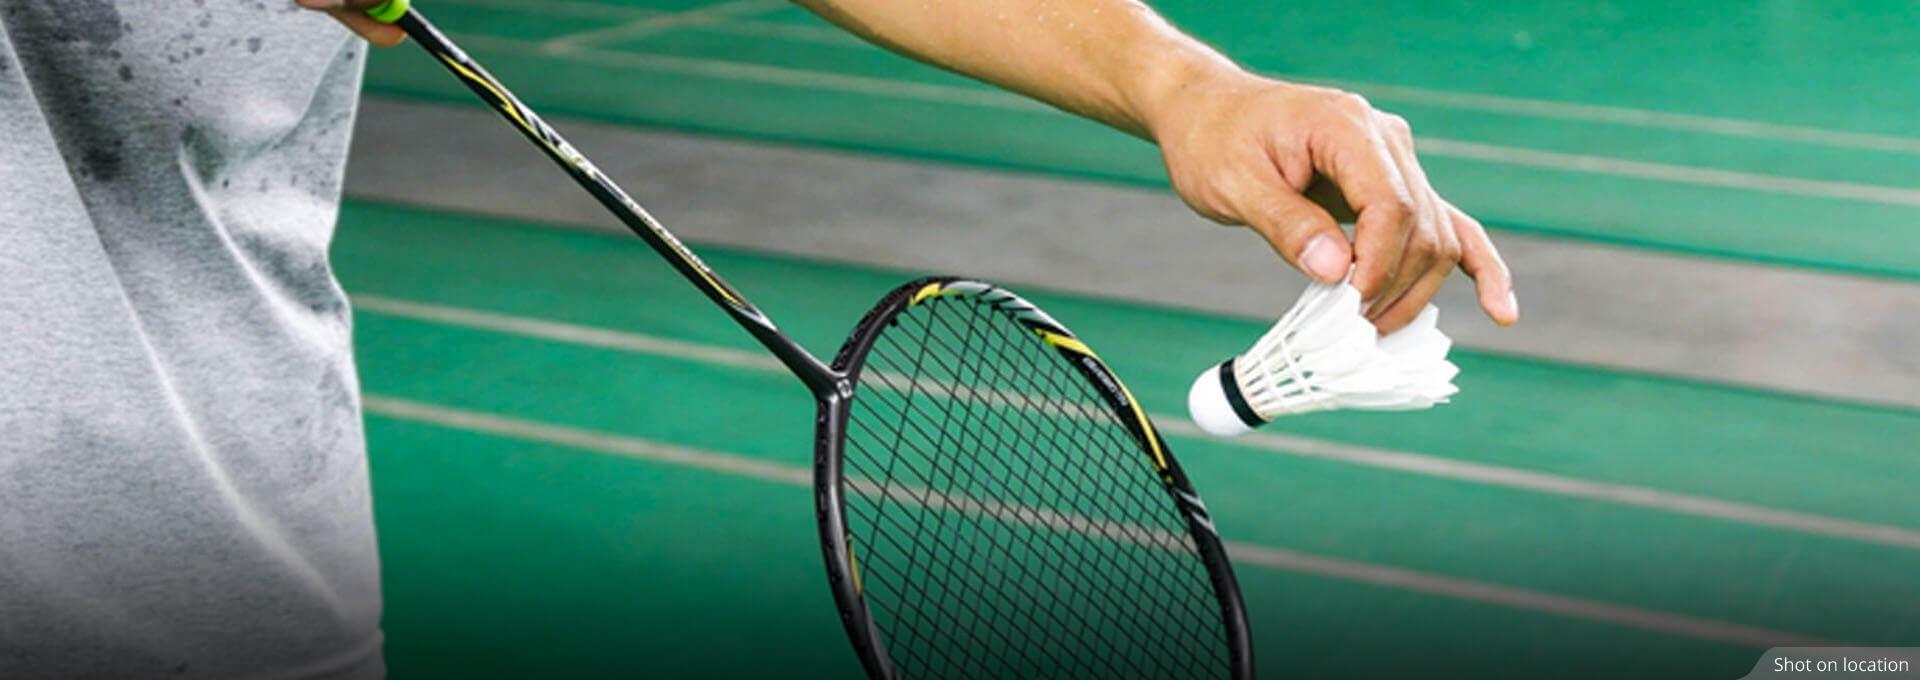 Badminton in Evita  by House of Hirandani in Bannerghatta, Bengaluru